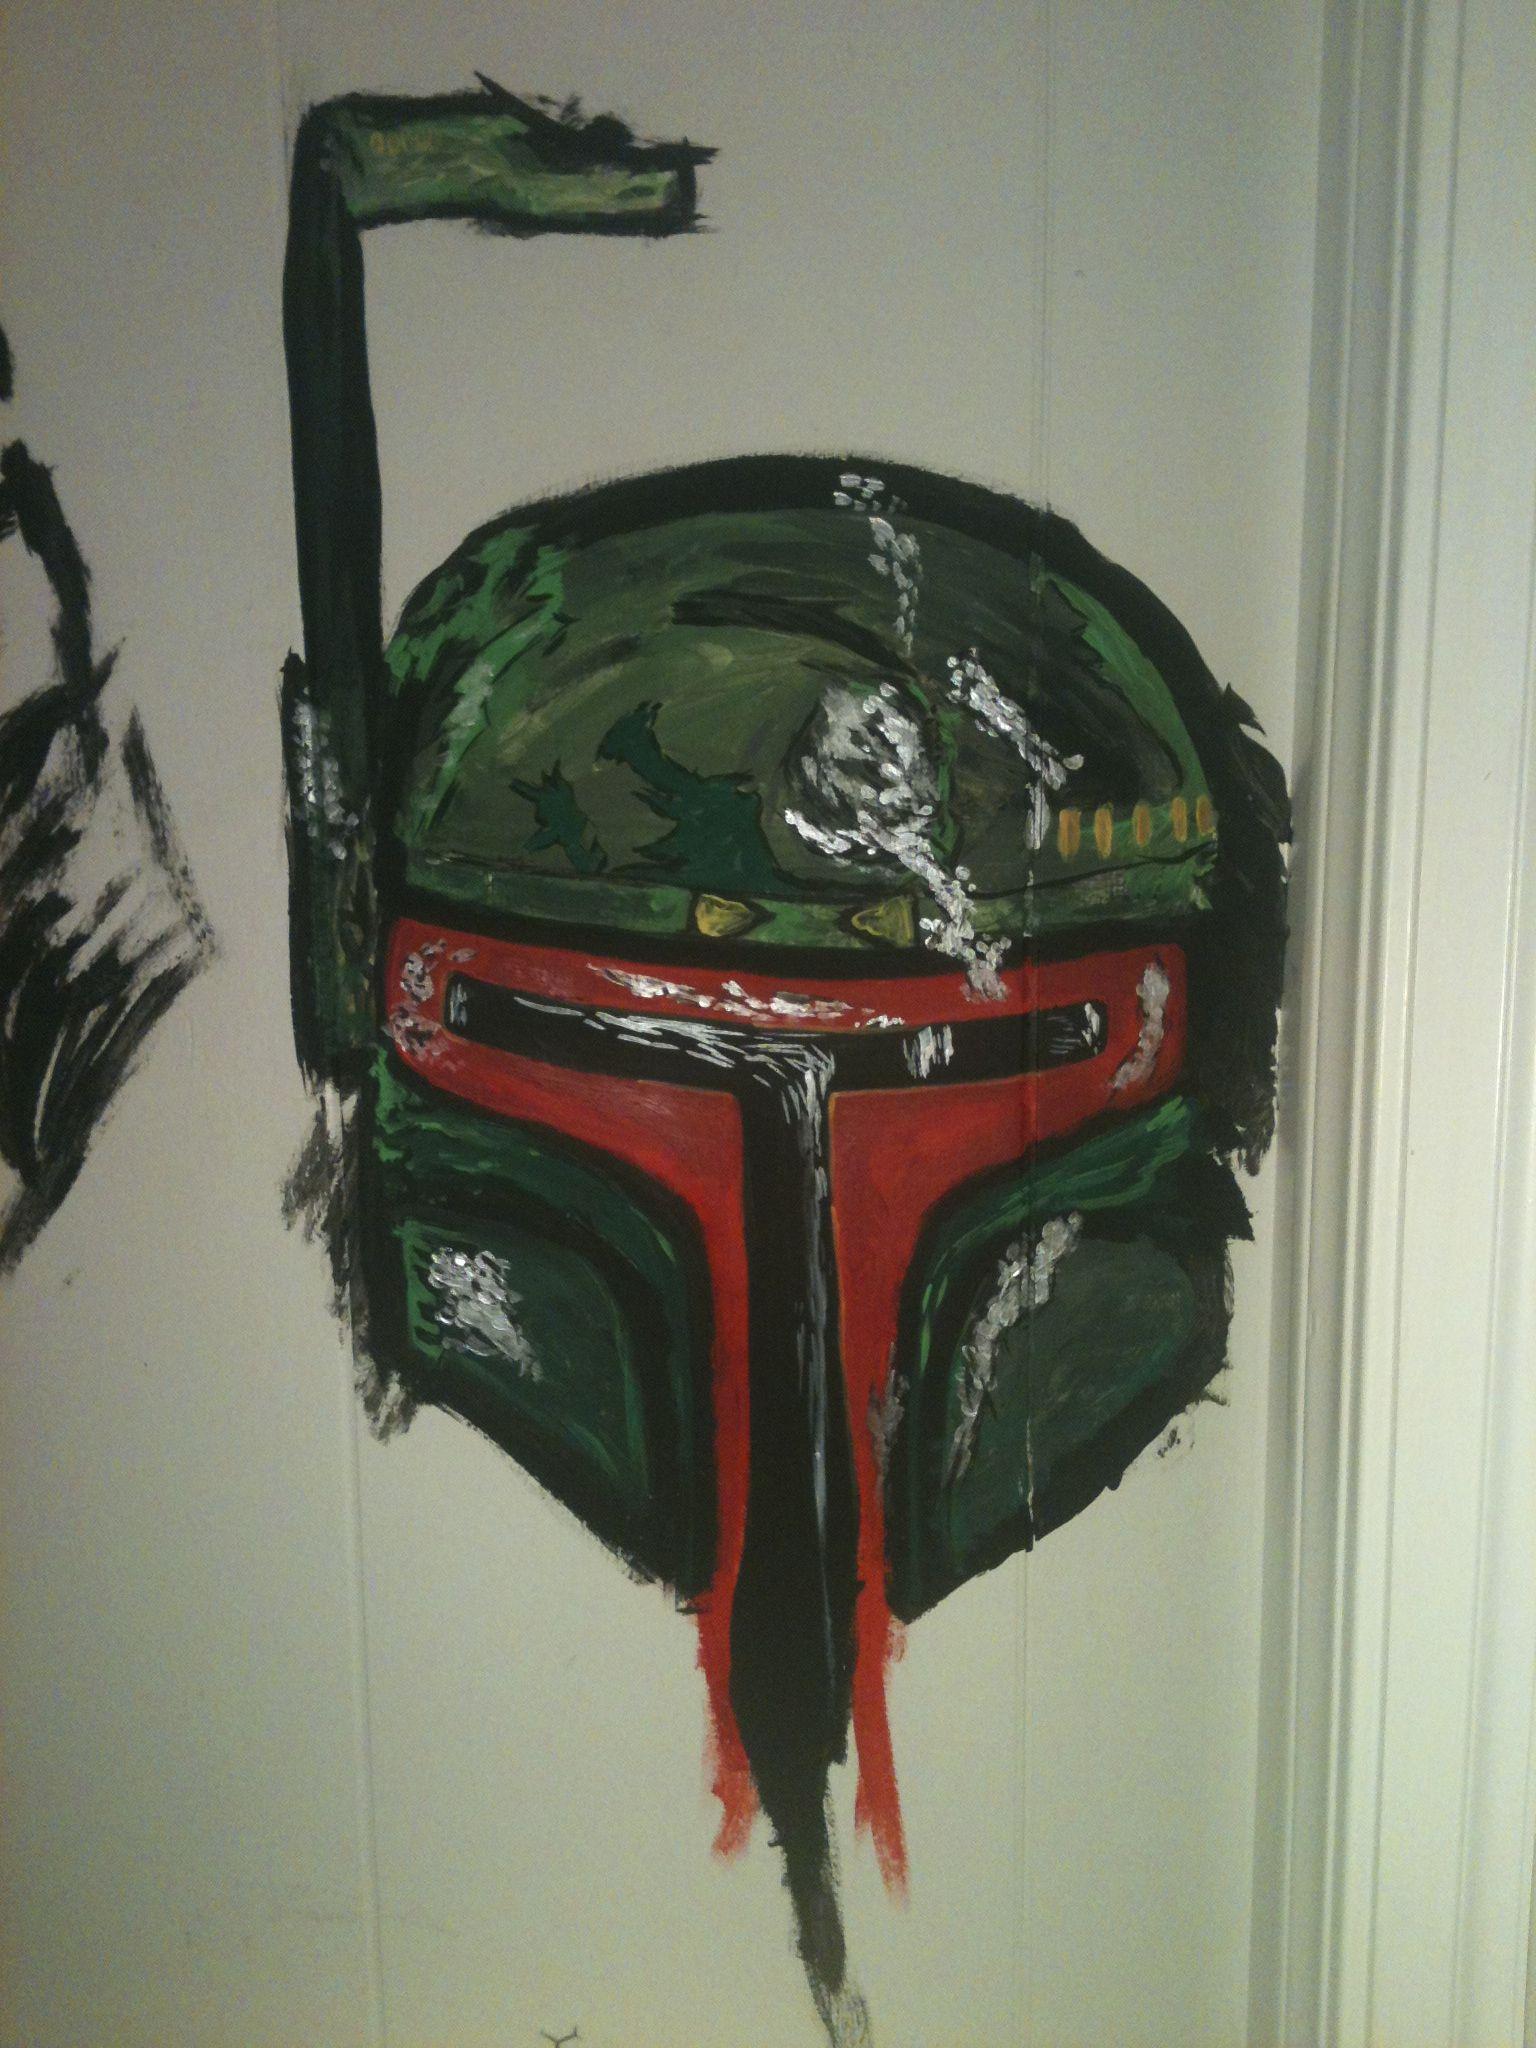 Boba fett helmet i painted on the wall of my art room